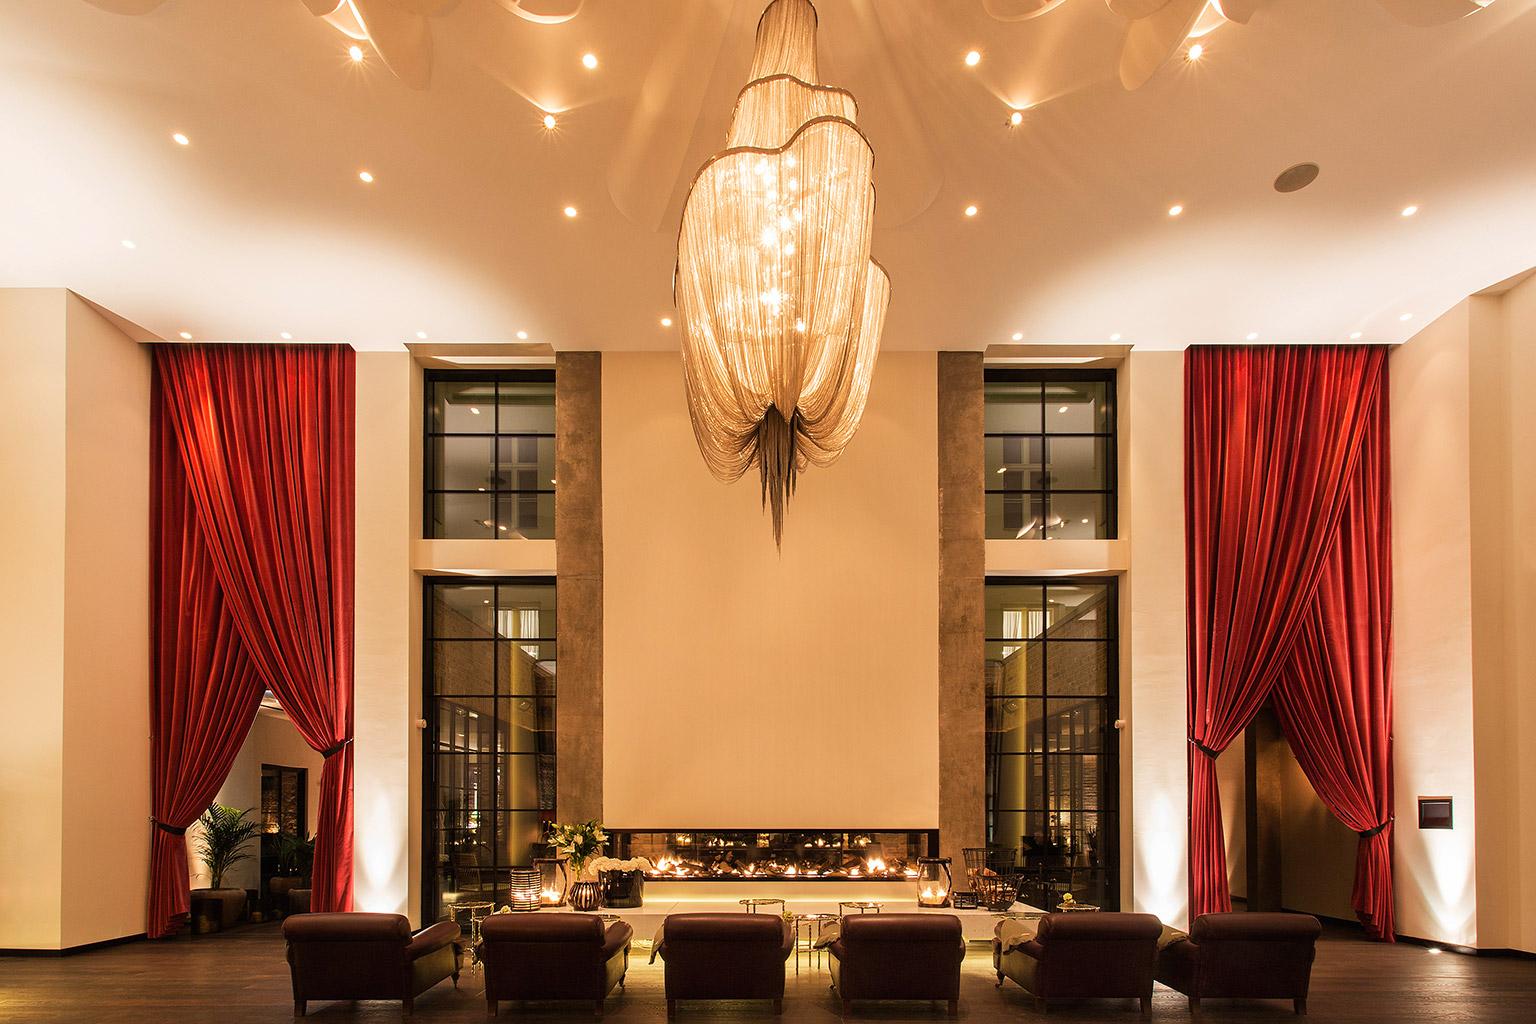 Hotel zoo berlin luxushotels bei designreisen for Design hotel hofgut